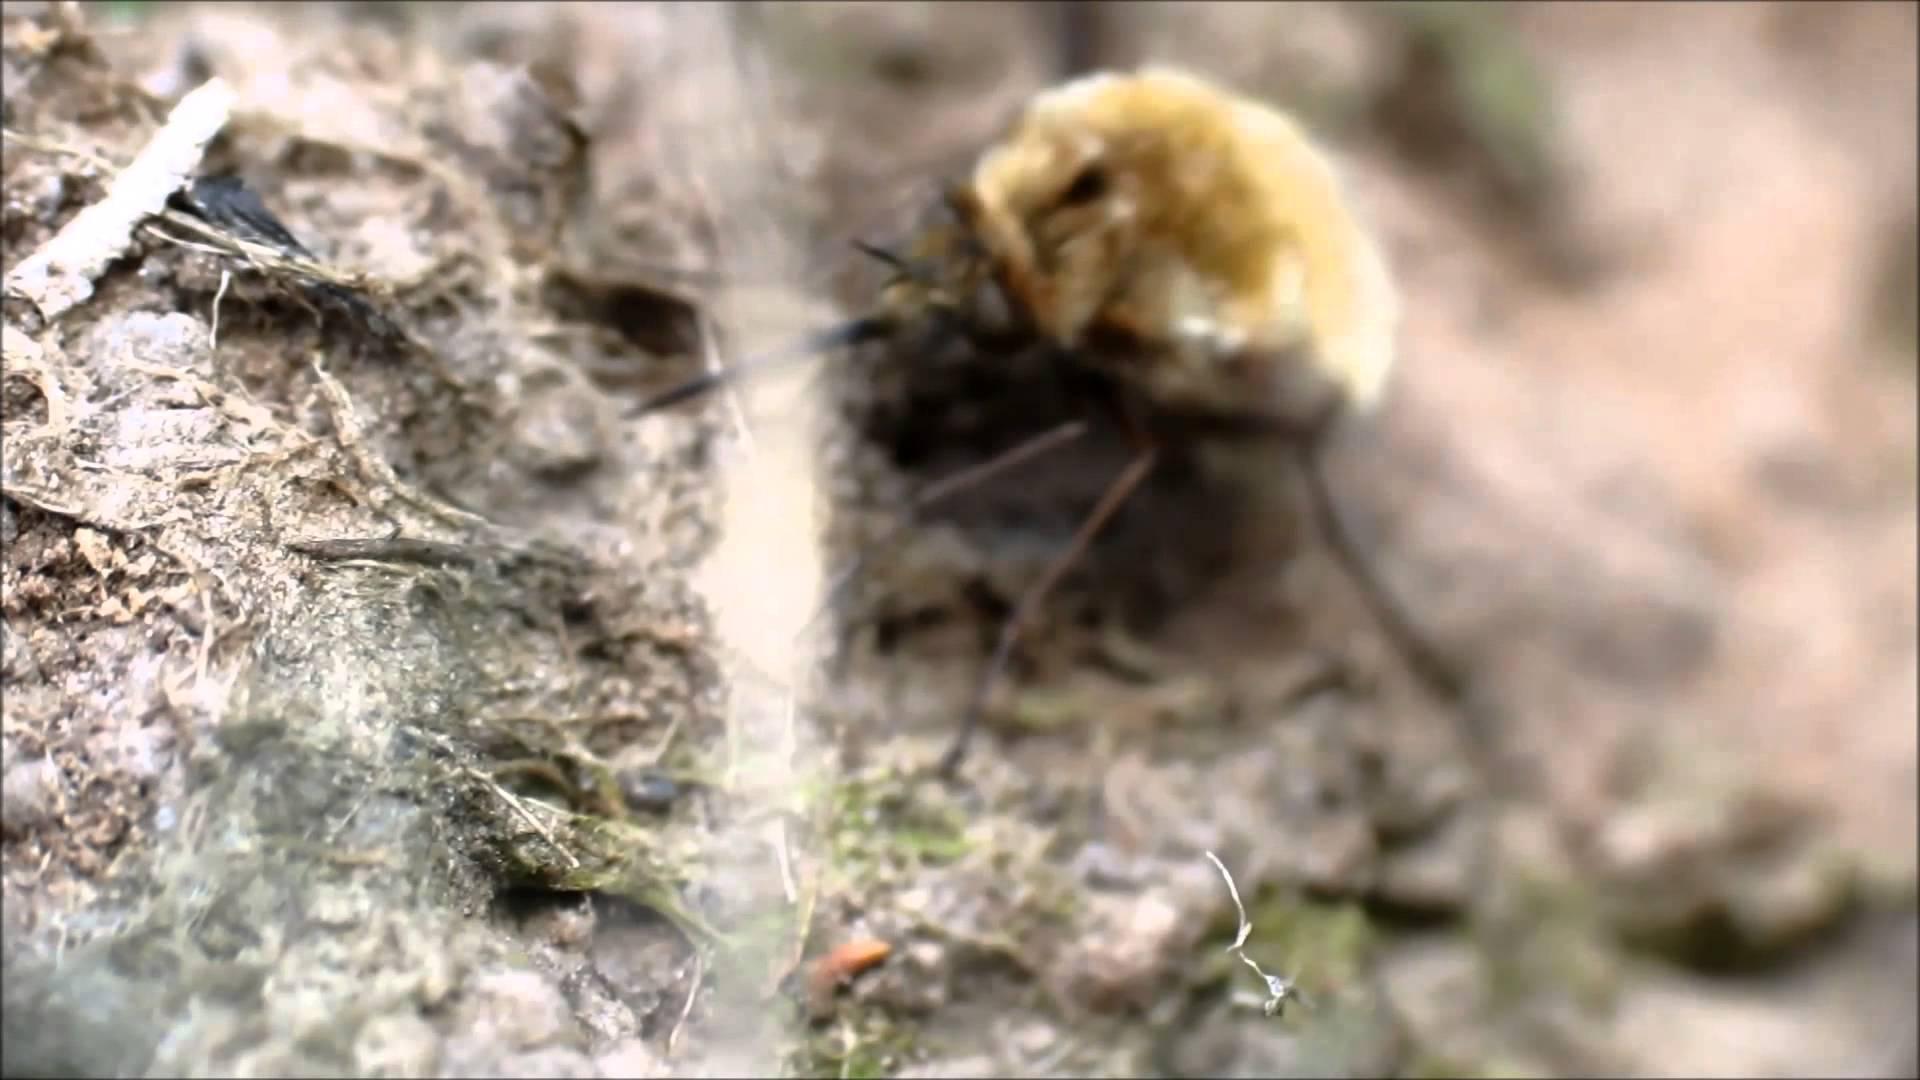 Tiger beetle bee photo